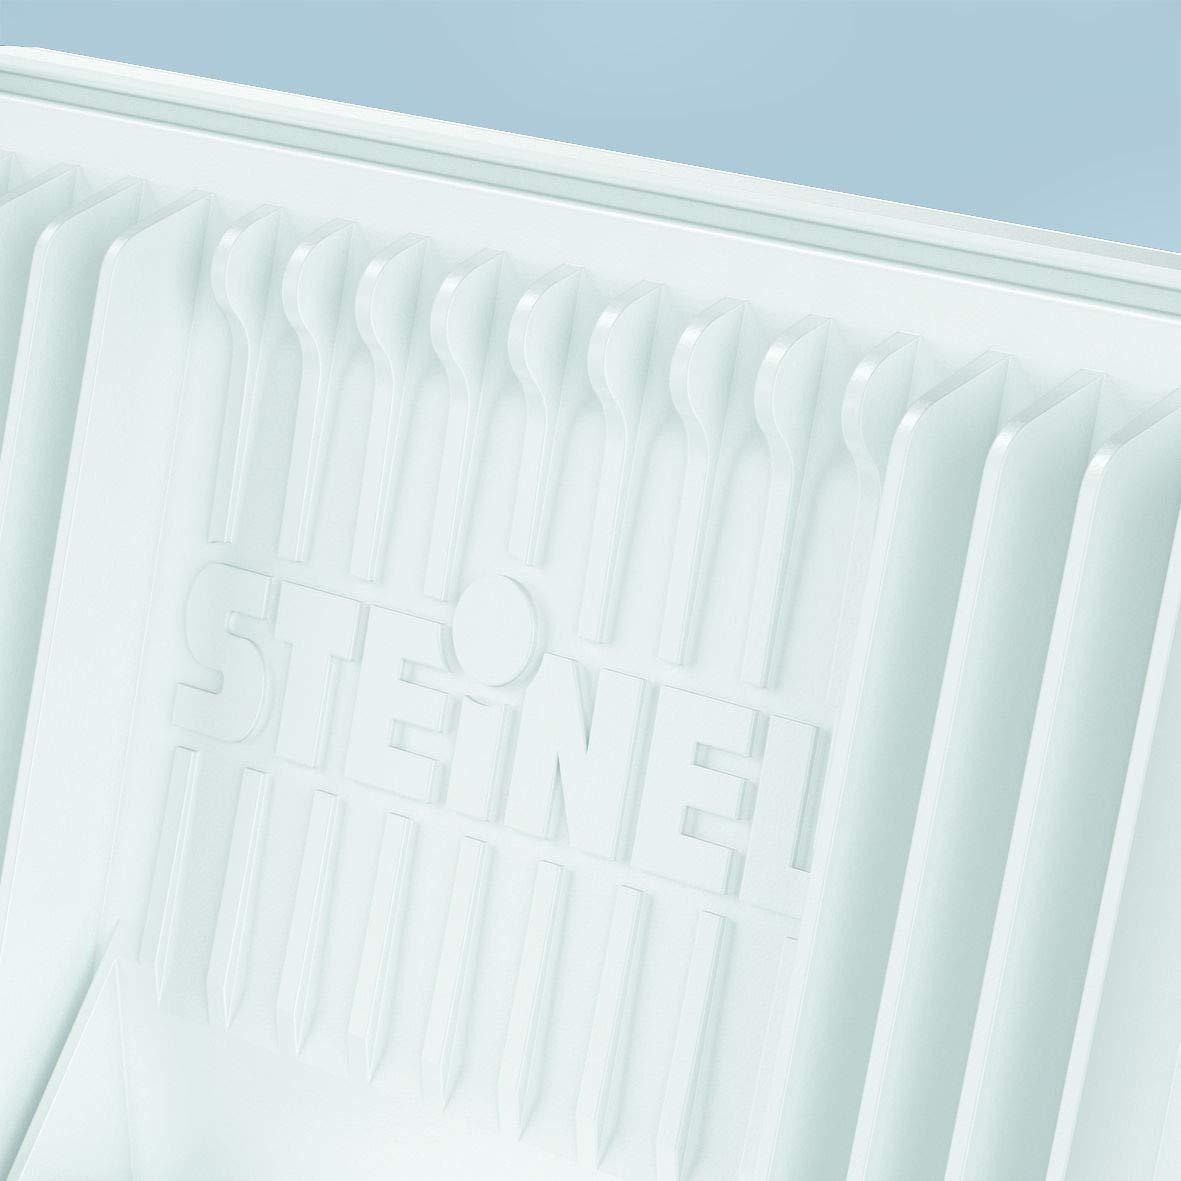 Steinel Smart Home LED exterior Xled Home 2 Integriert 14.8W Negro